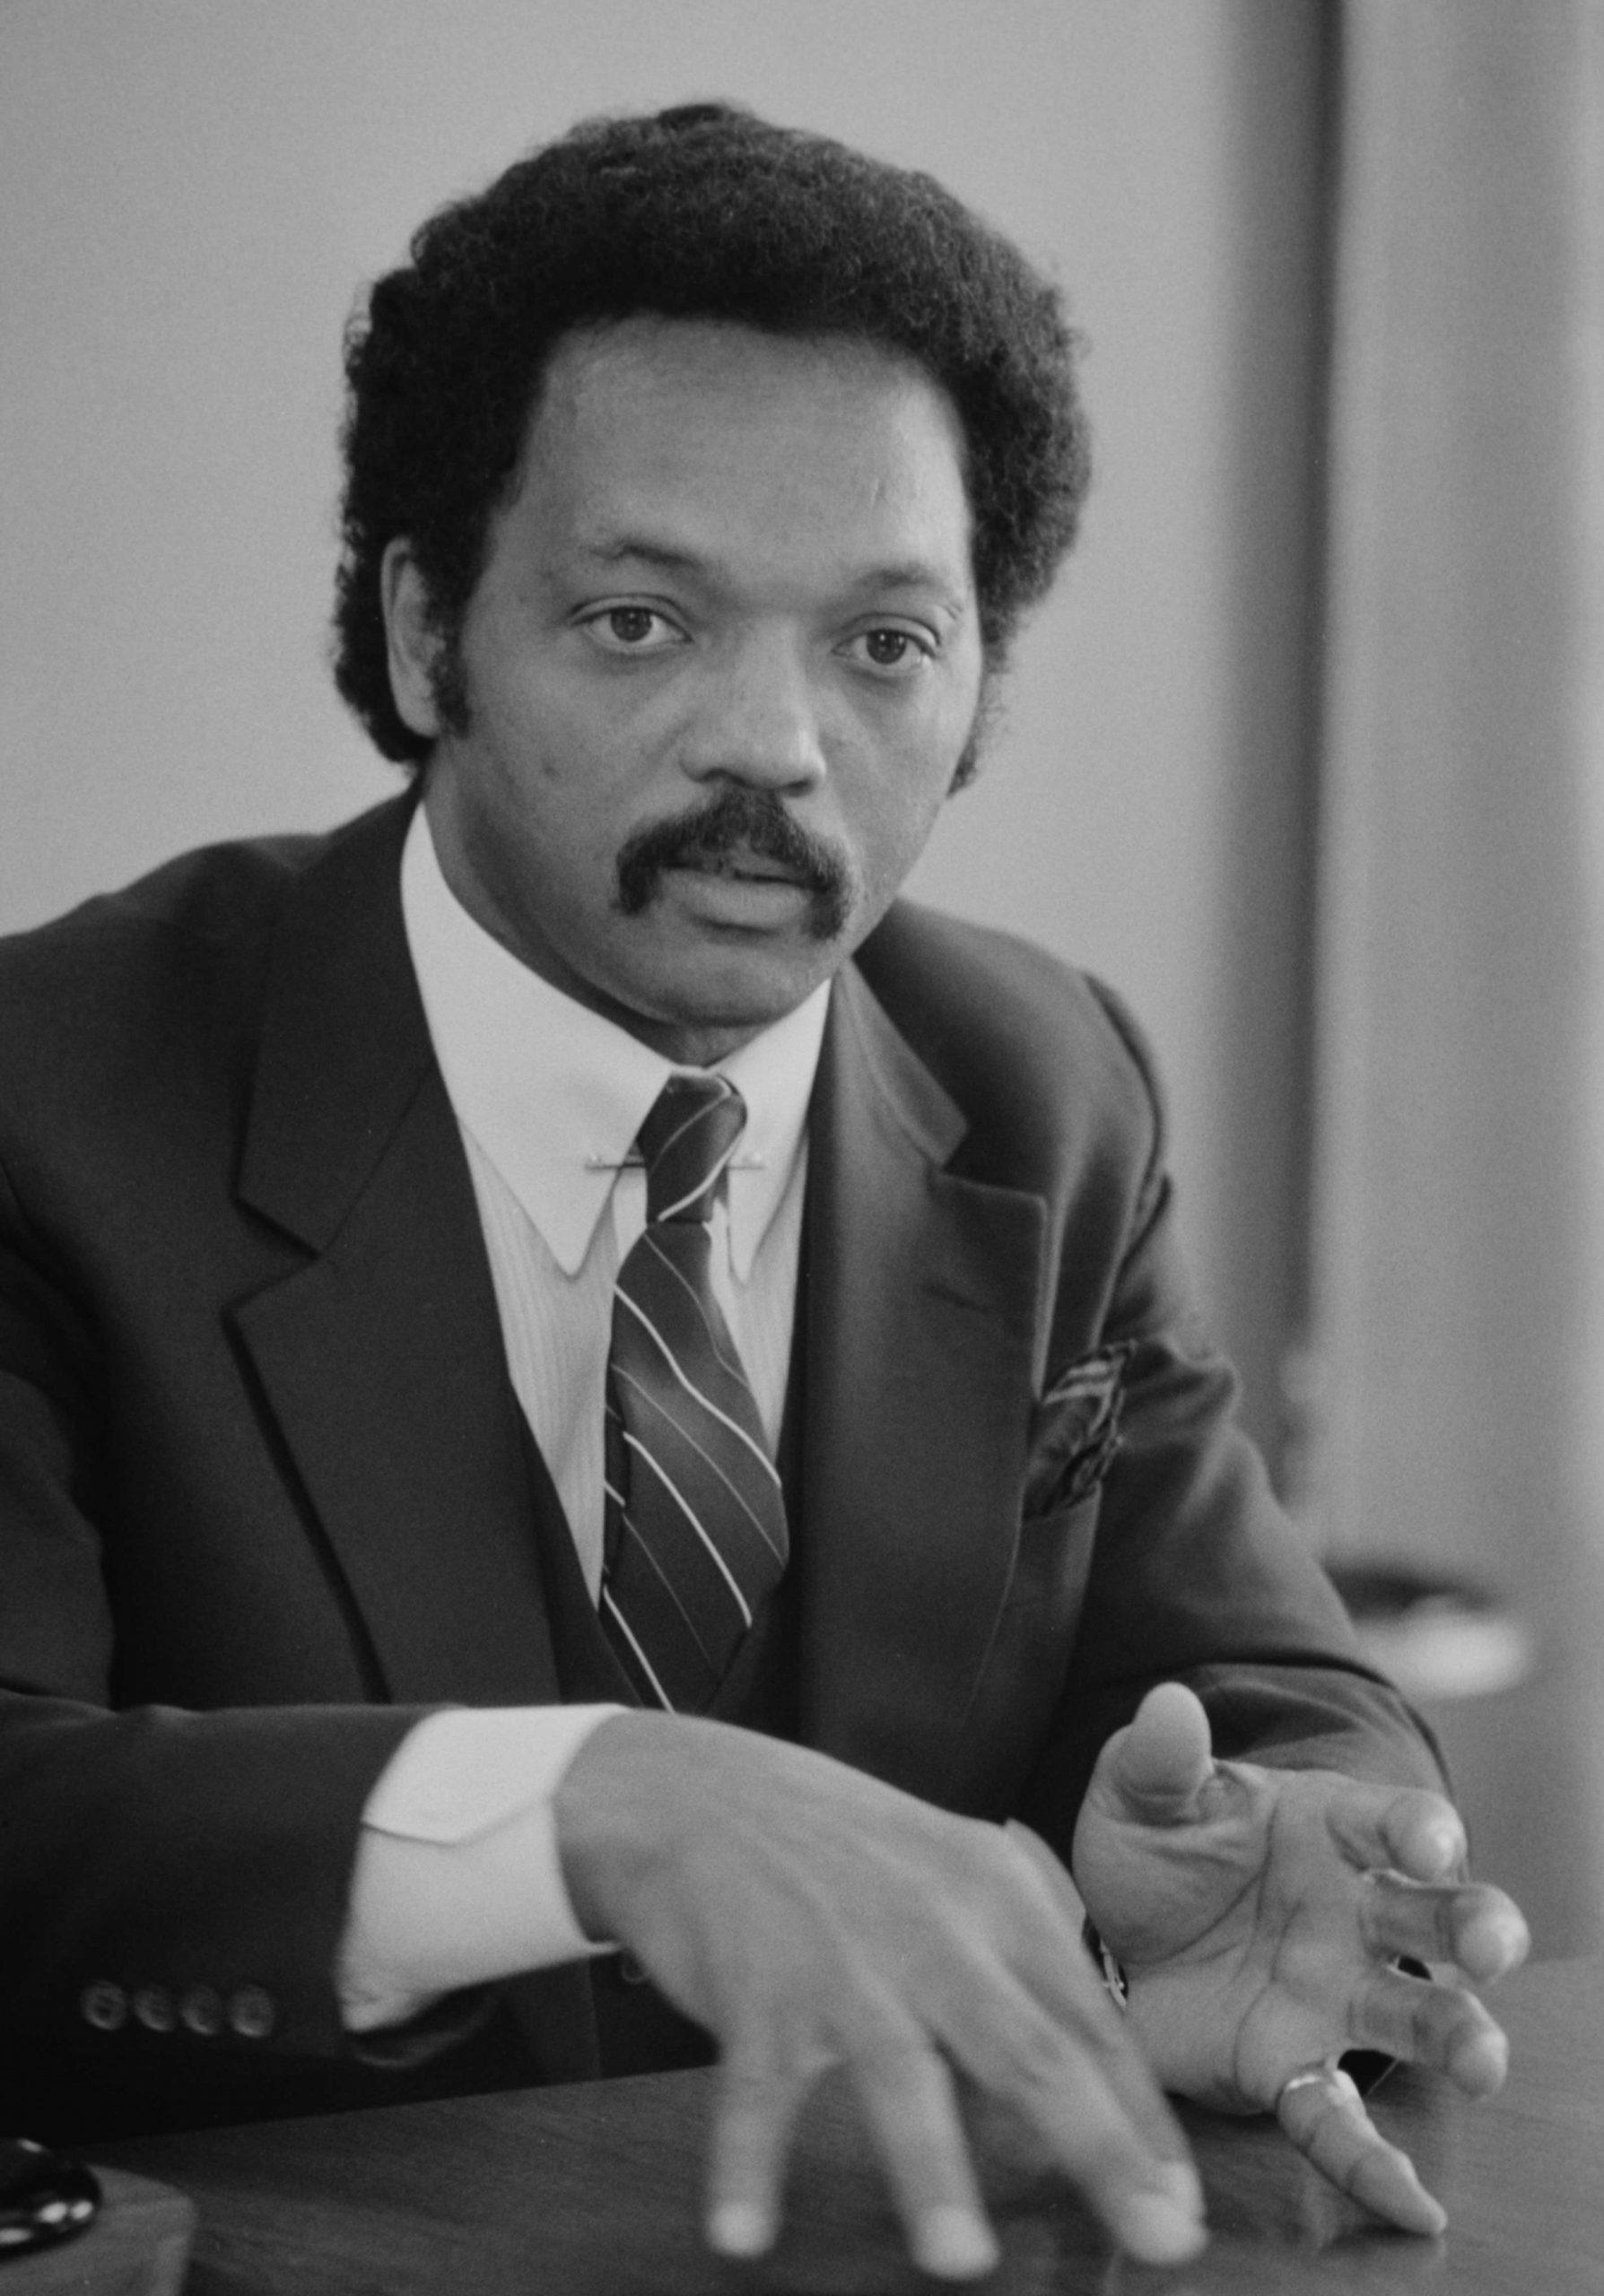 Jackson in 1983